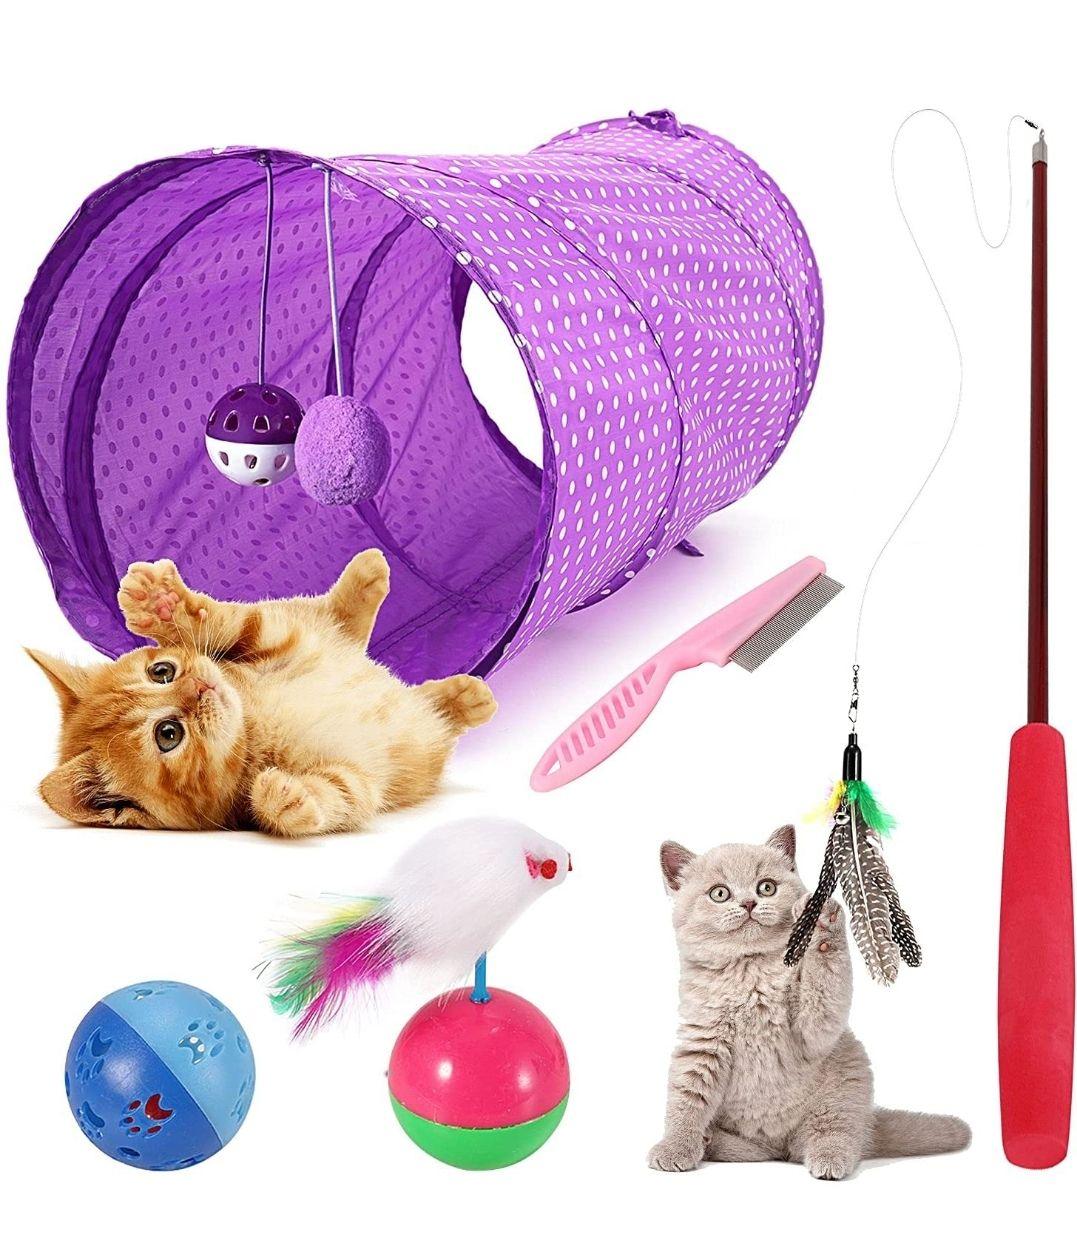 Surtido 5 juguetes para gatos